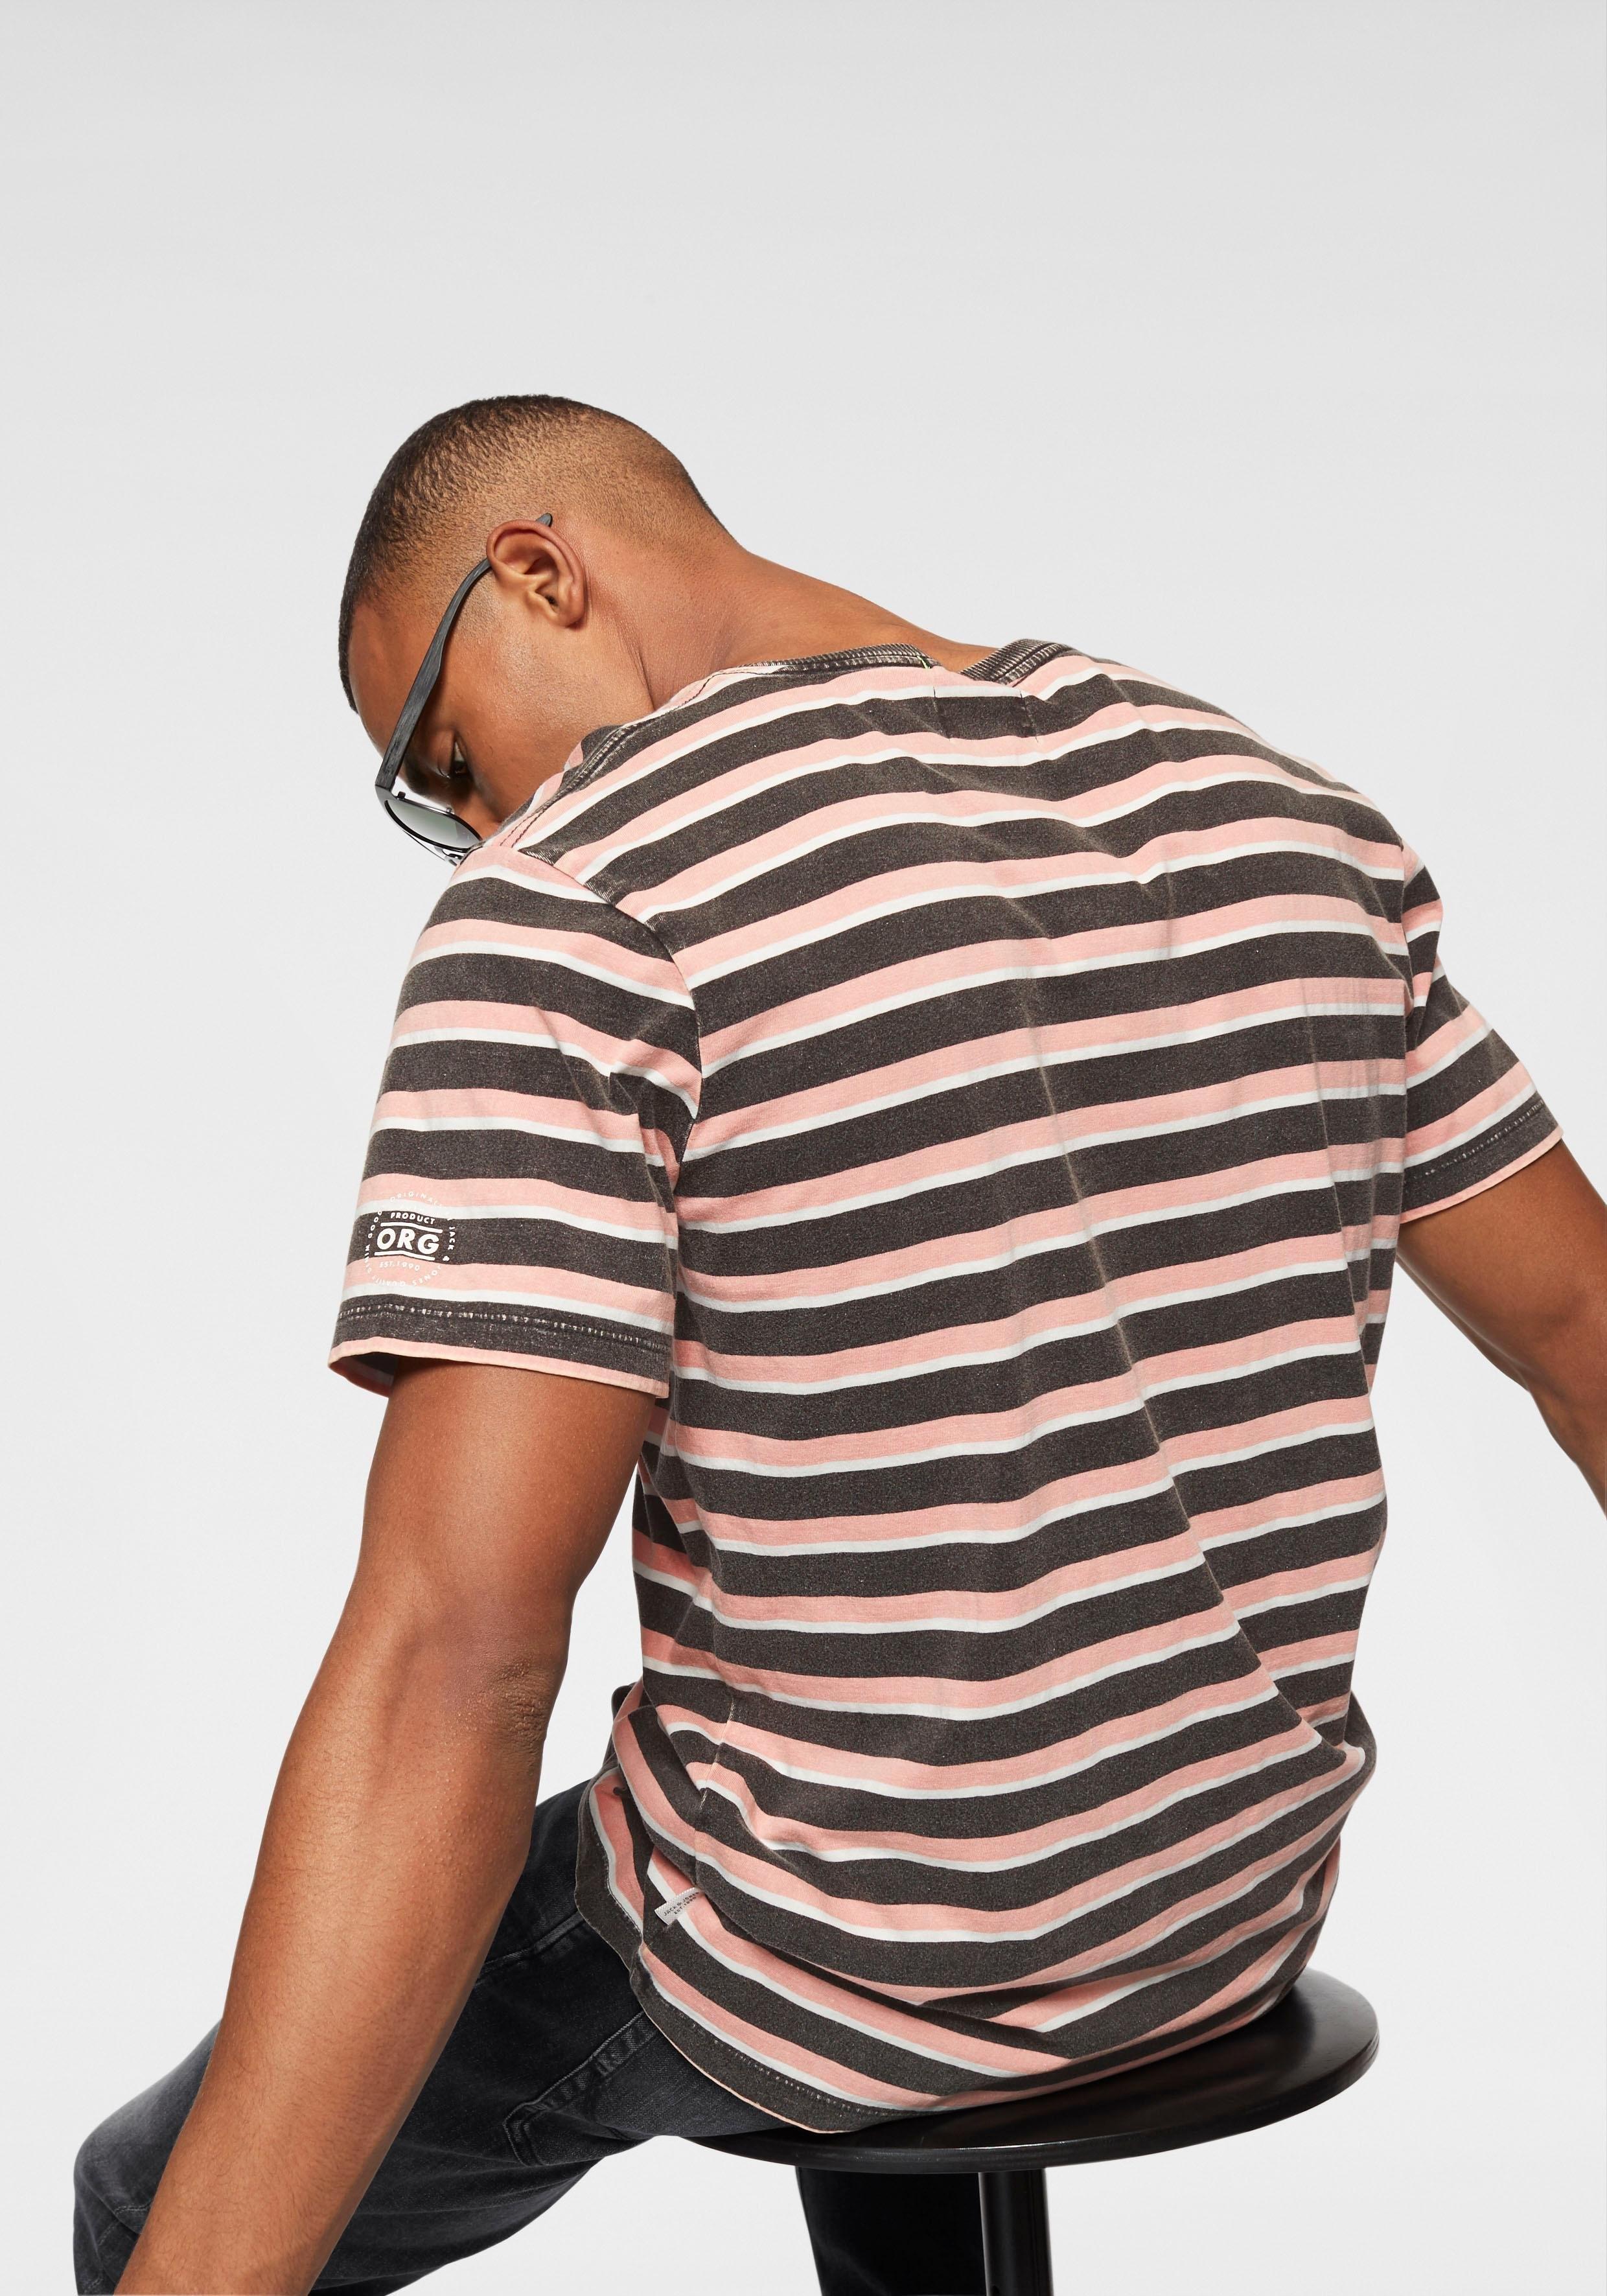 Jones Gekocht Tee Snel Online T Jackamp; shirtjorhank 8nPkXw0O